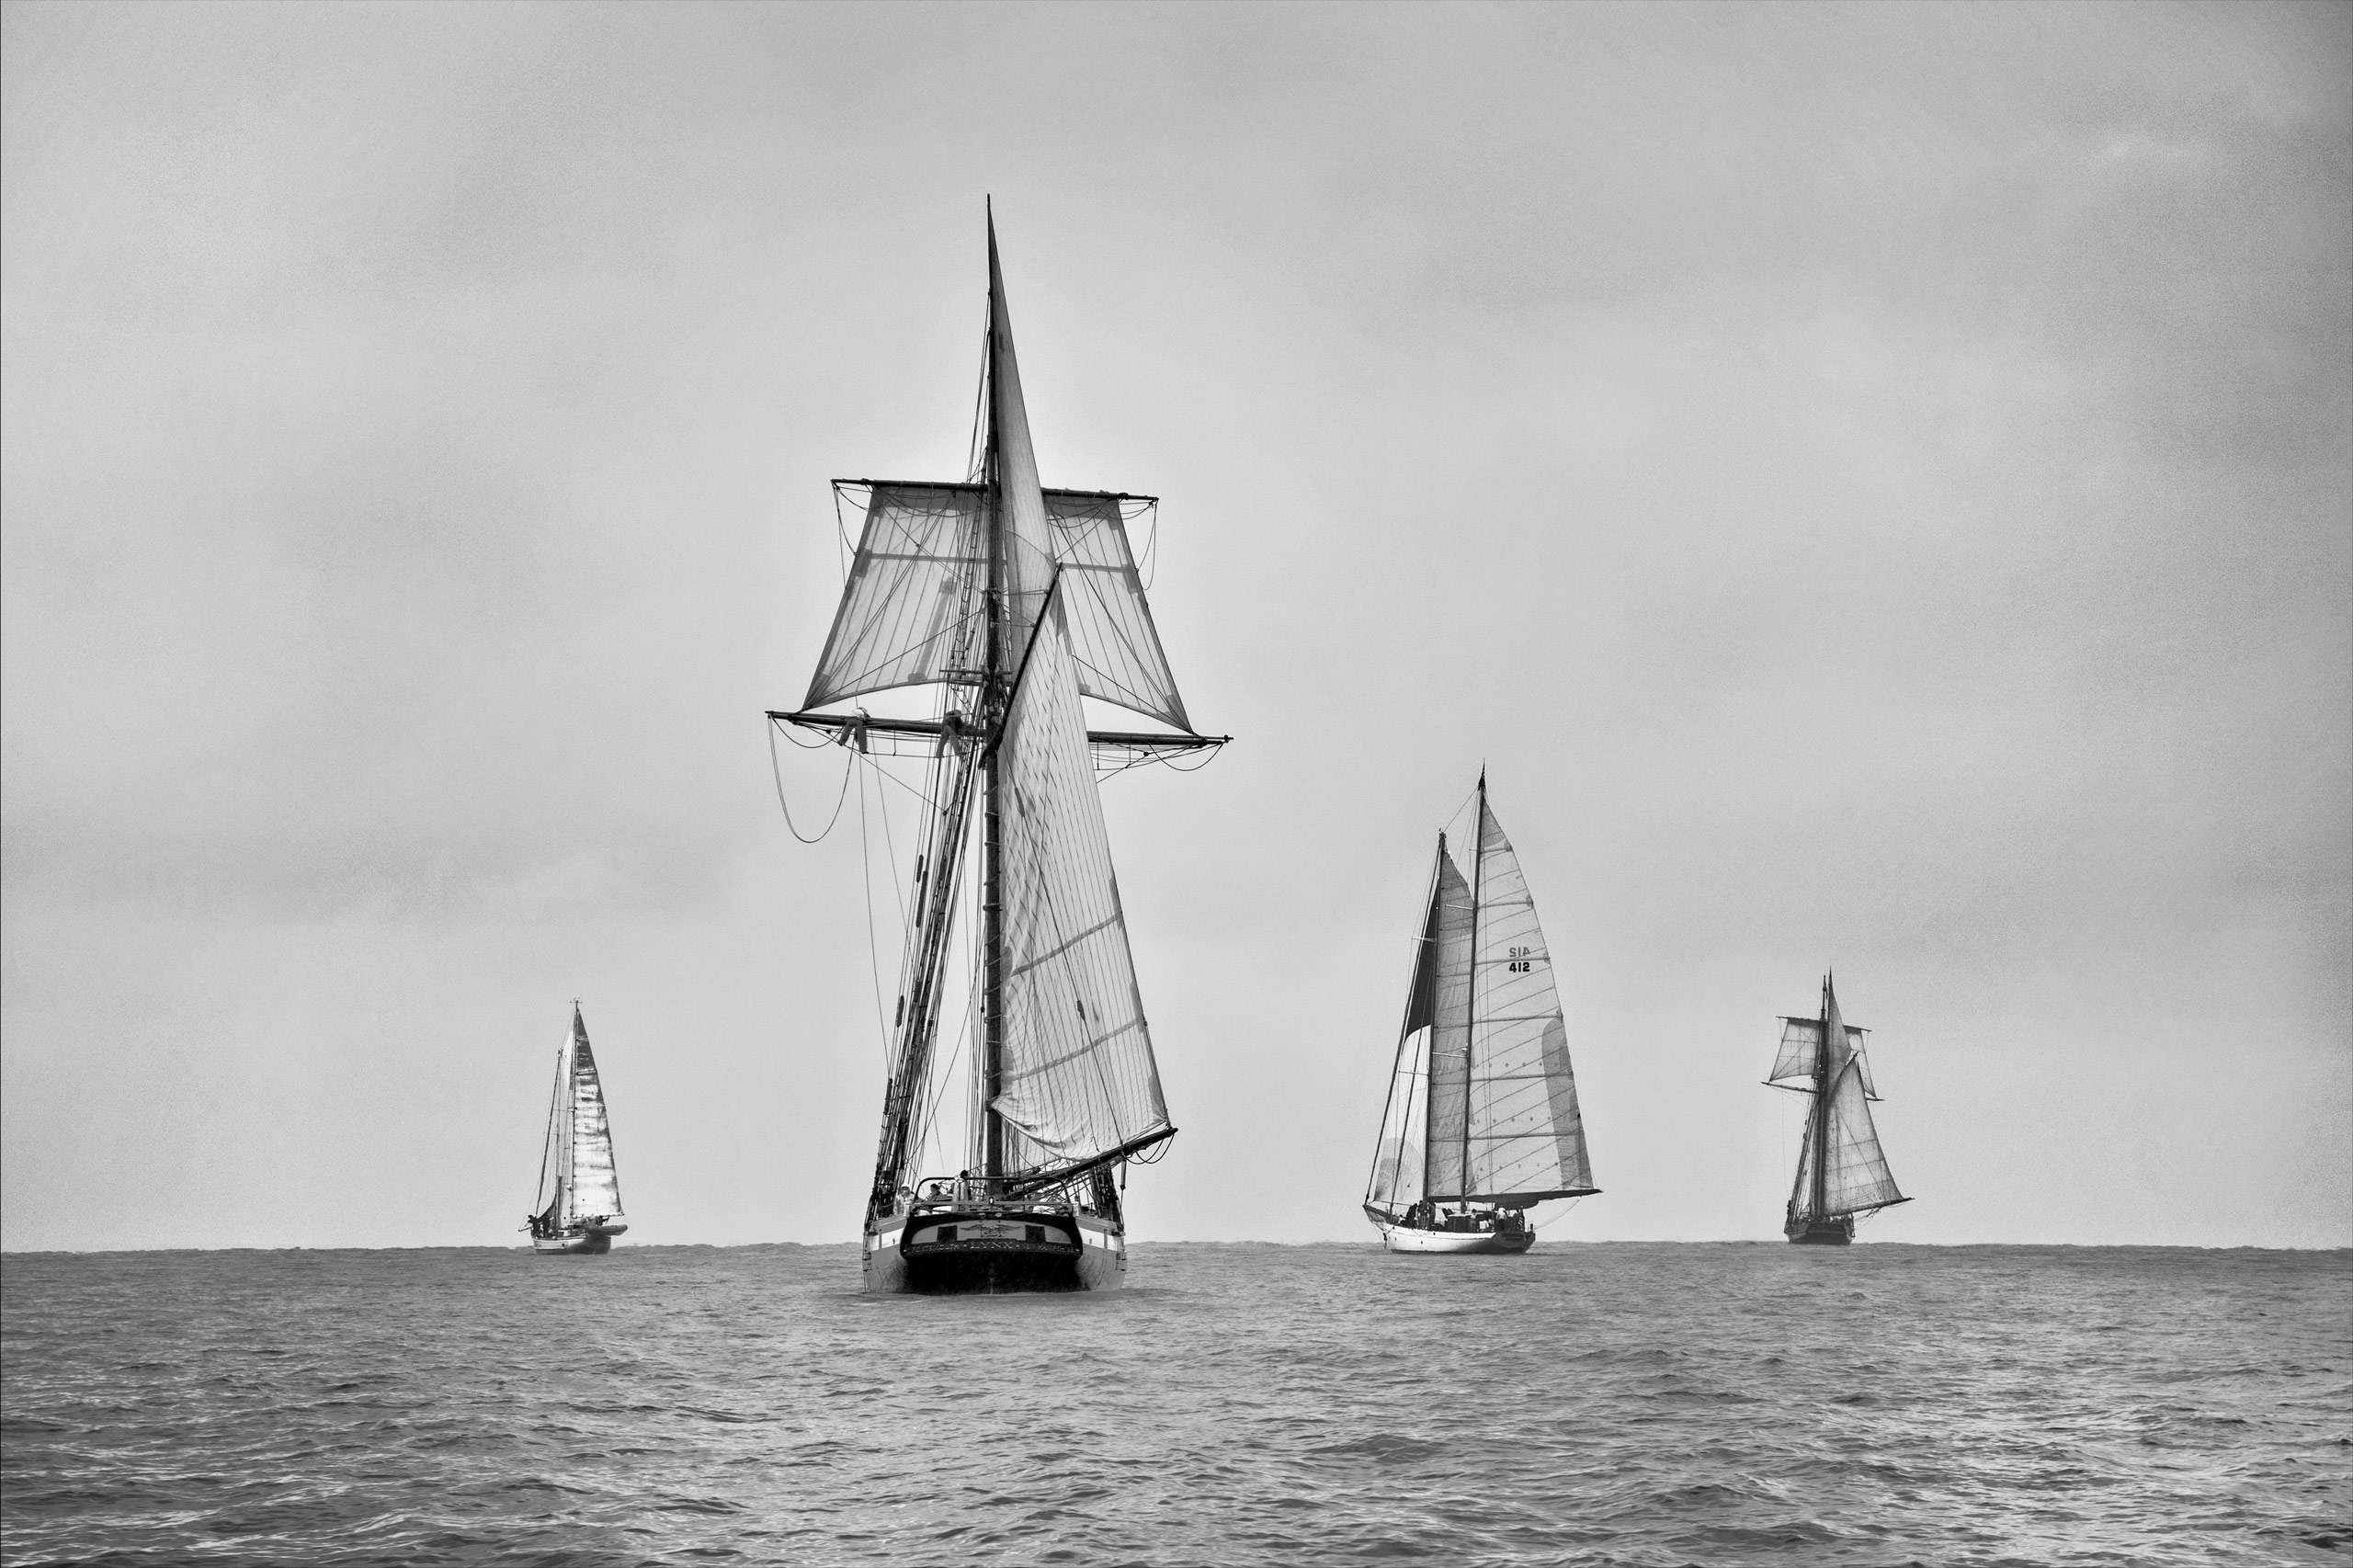 PORTFOLIO - Maritime #3 - B&W - PCG596